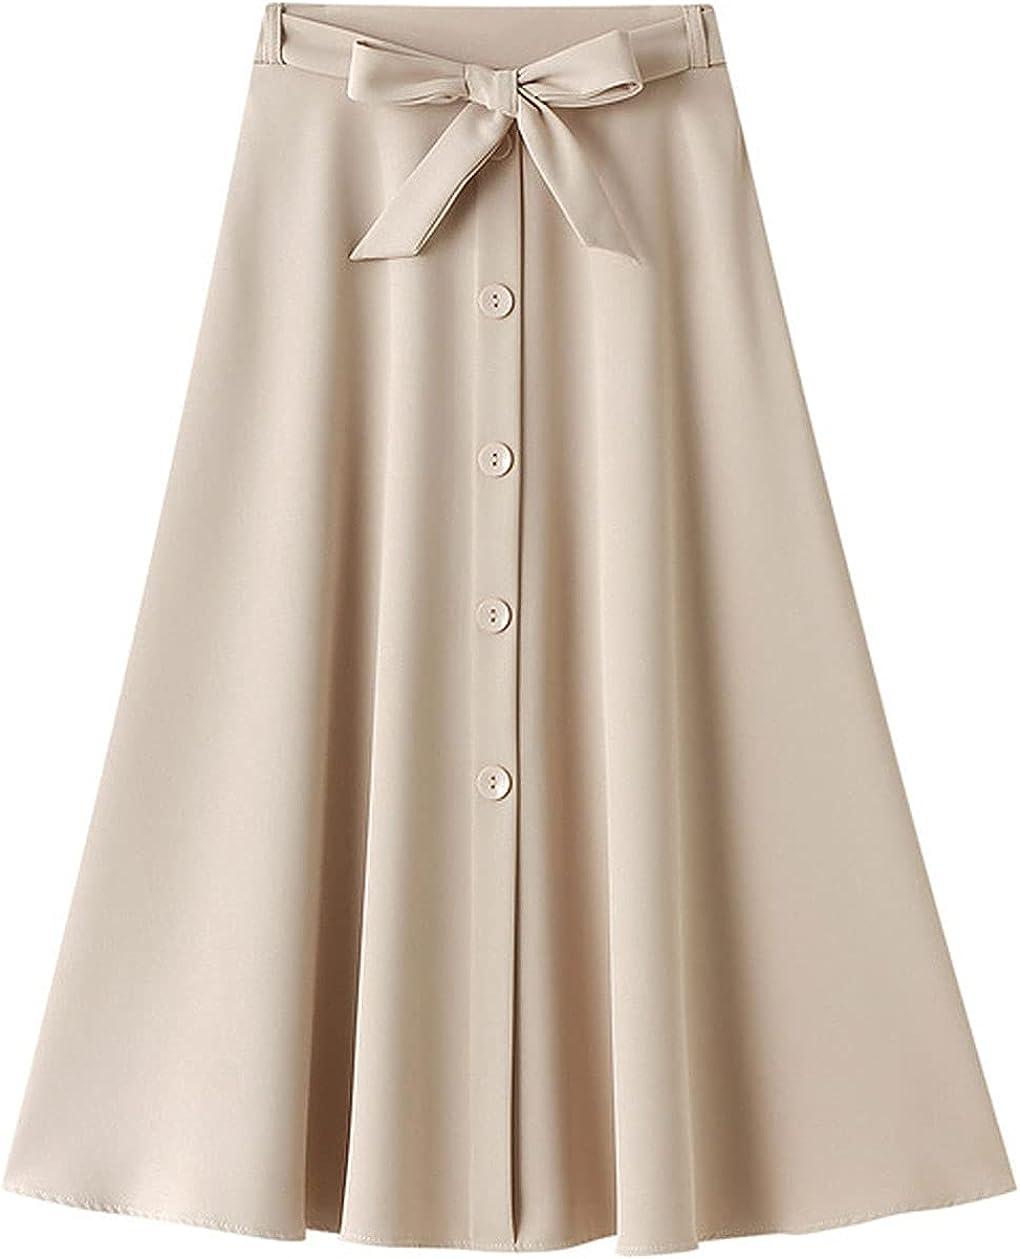 CHARTOU Women's Elegant Elastic High Waist Button Down Bowknot Ruffle A-Line Midi Skirt